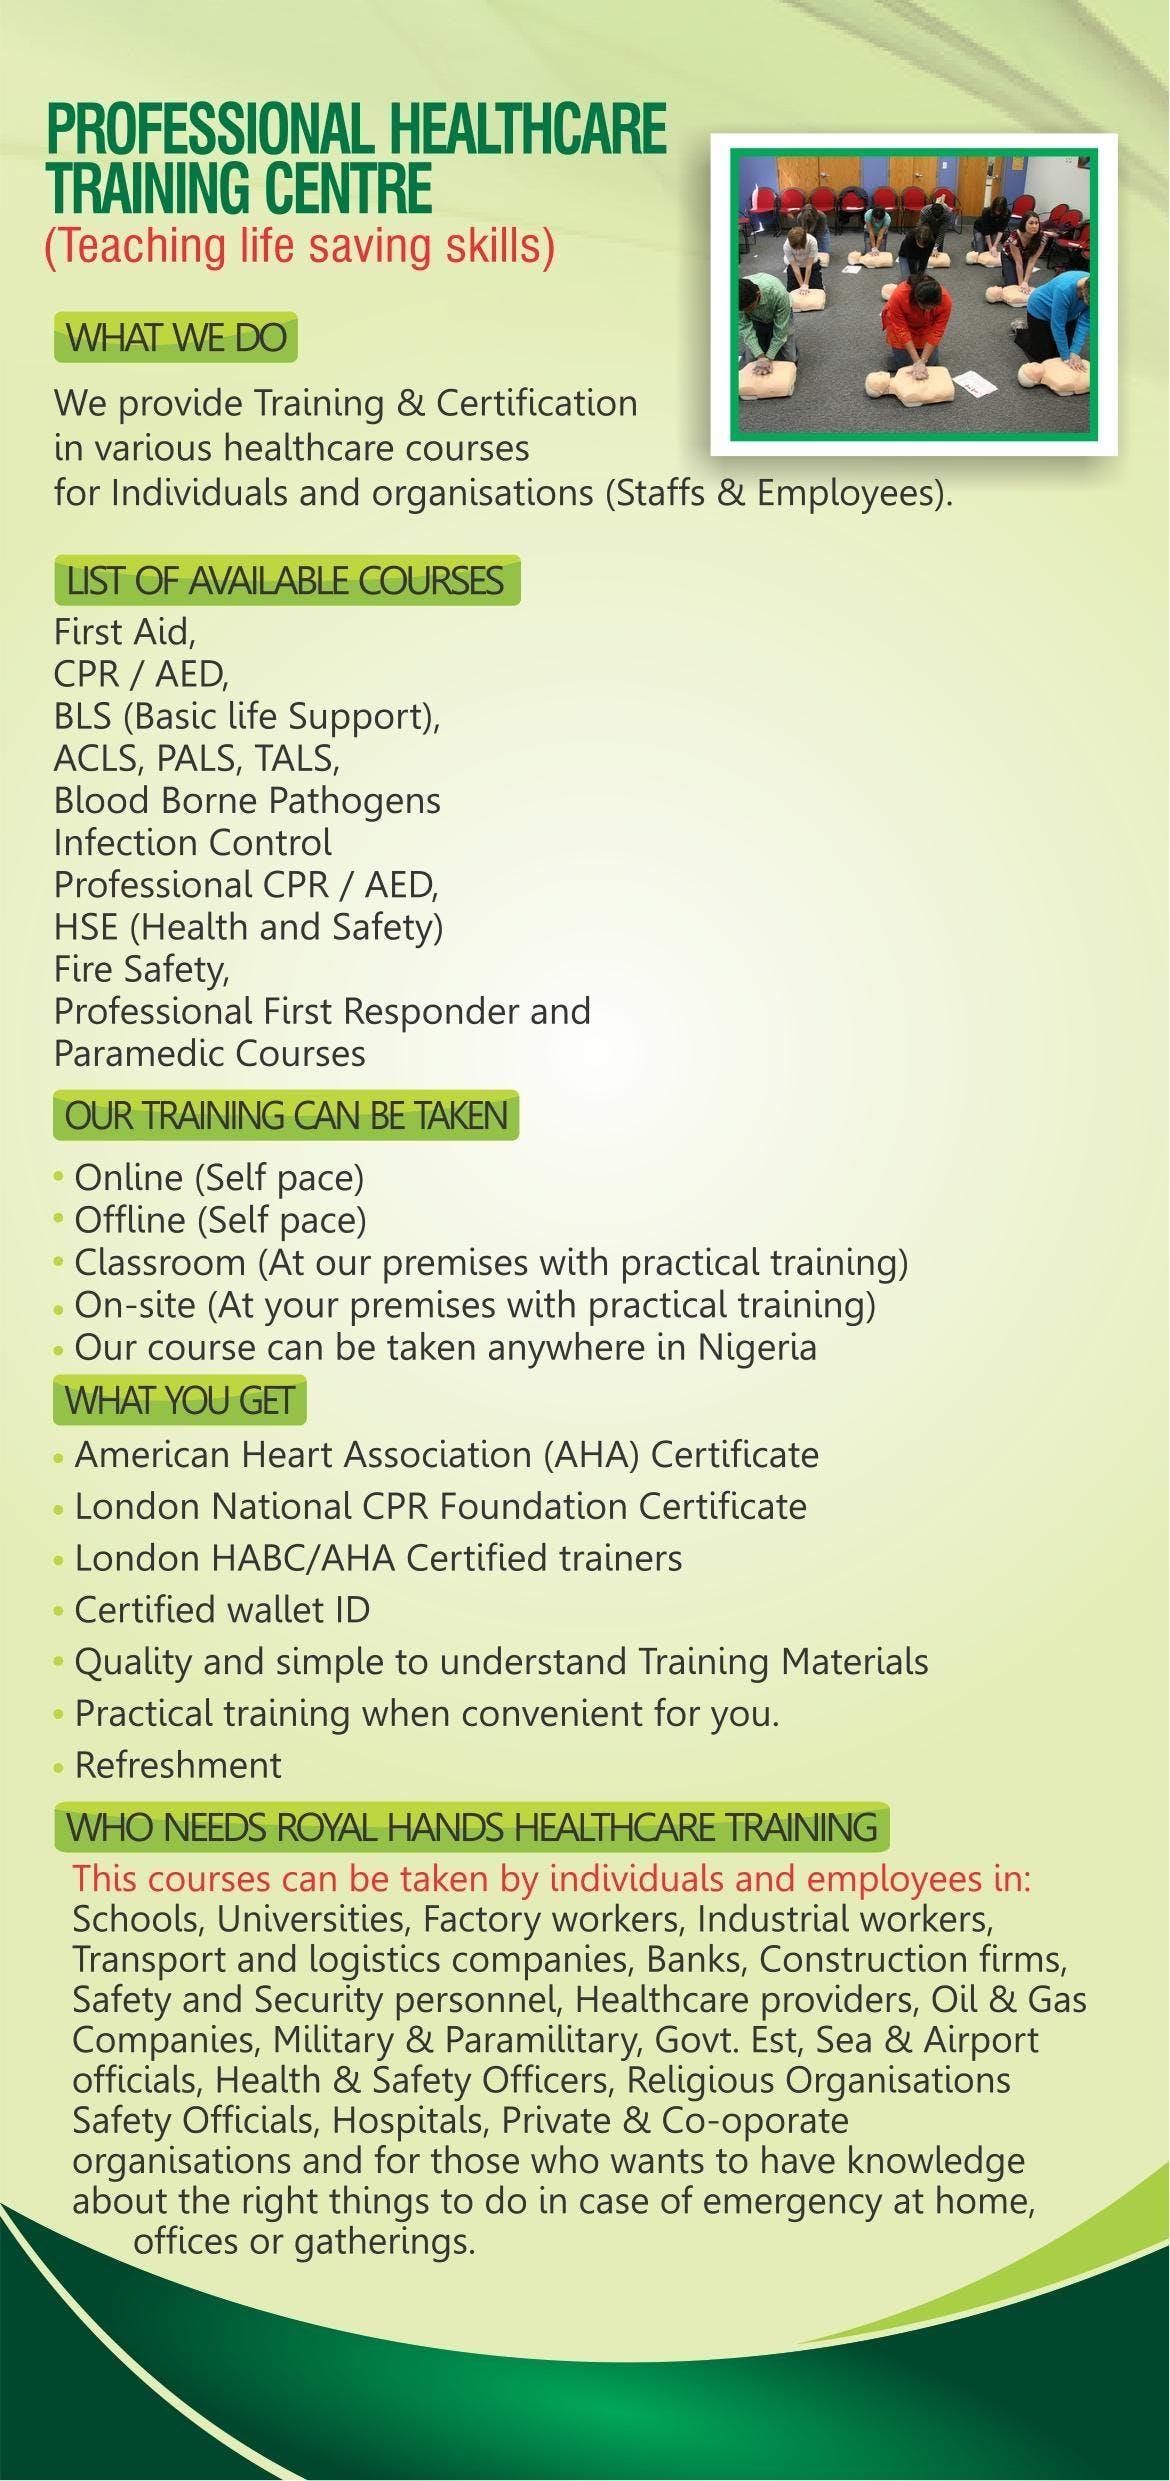 Basic Medicalhealth Training Blsfirst Aid Others Ikeja